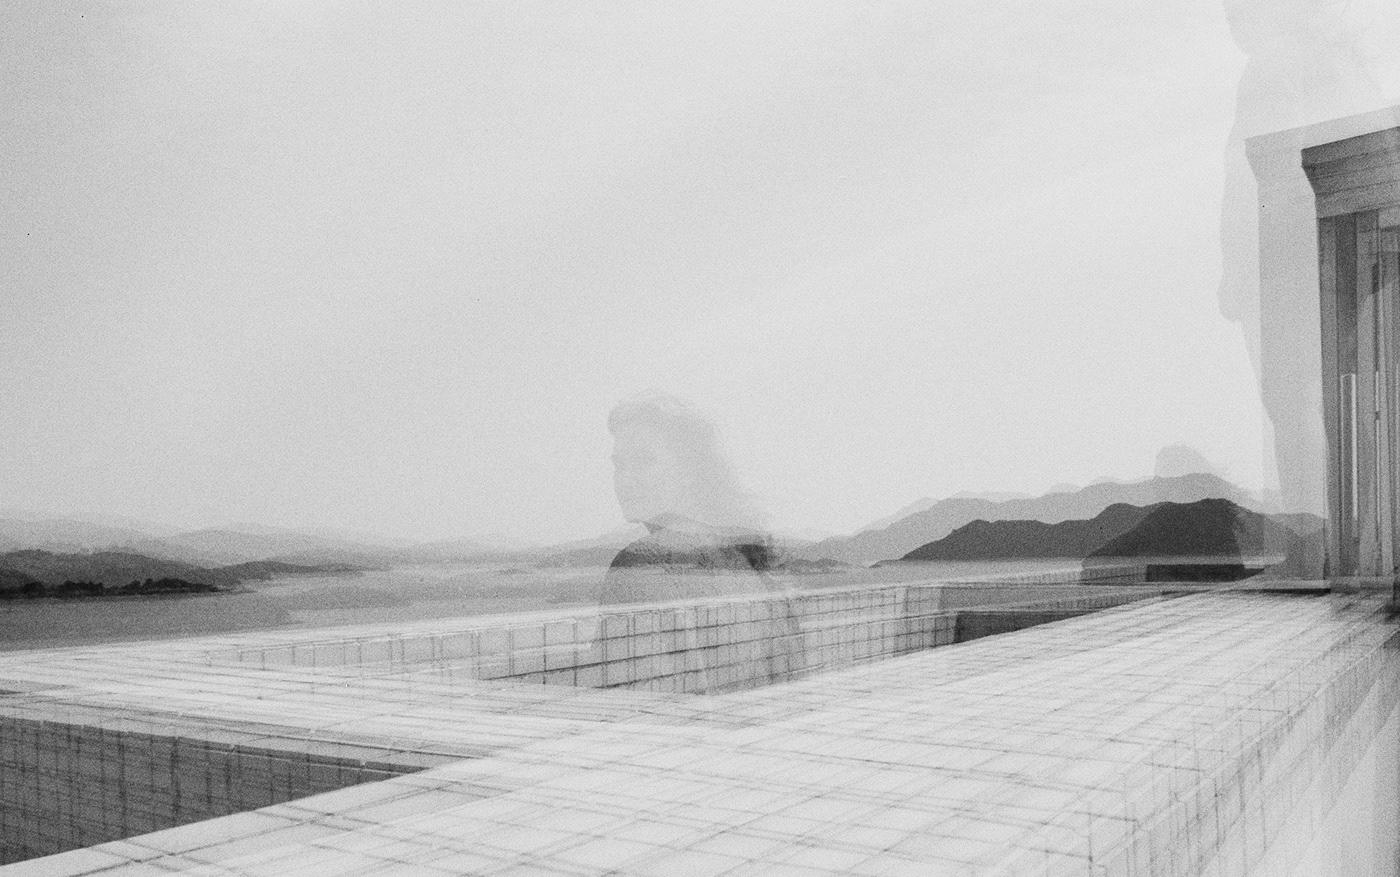 35mm black and white Film   Isolation Nikon